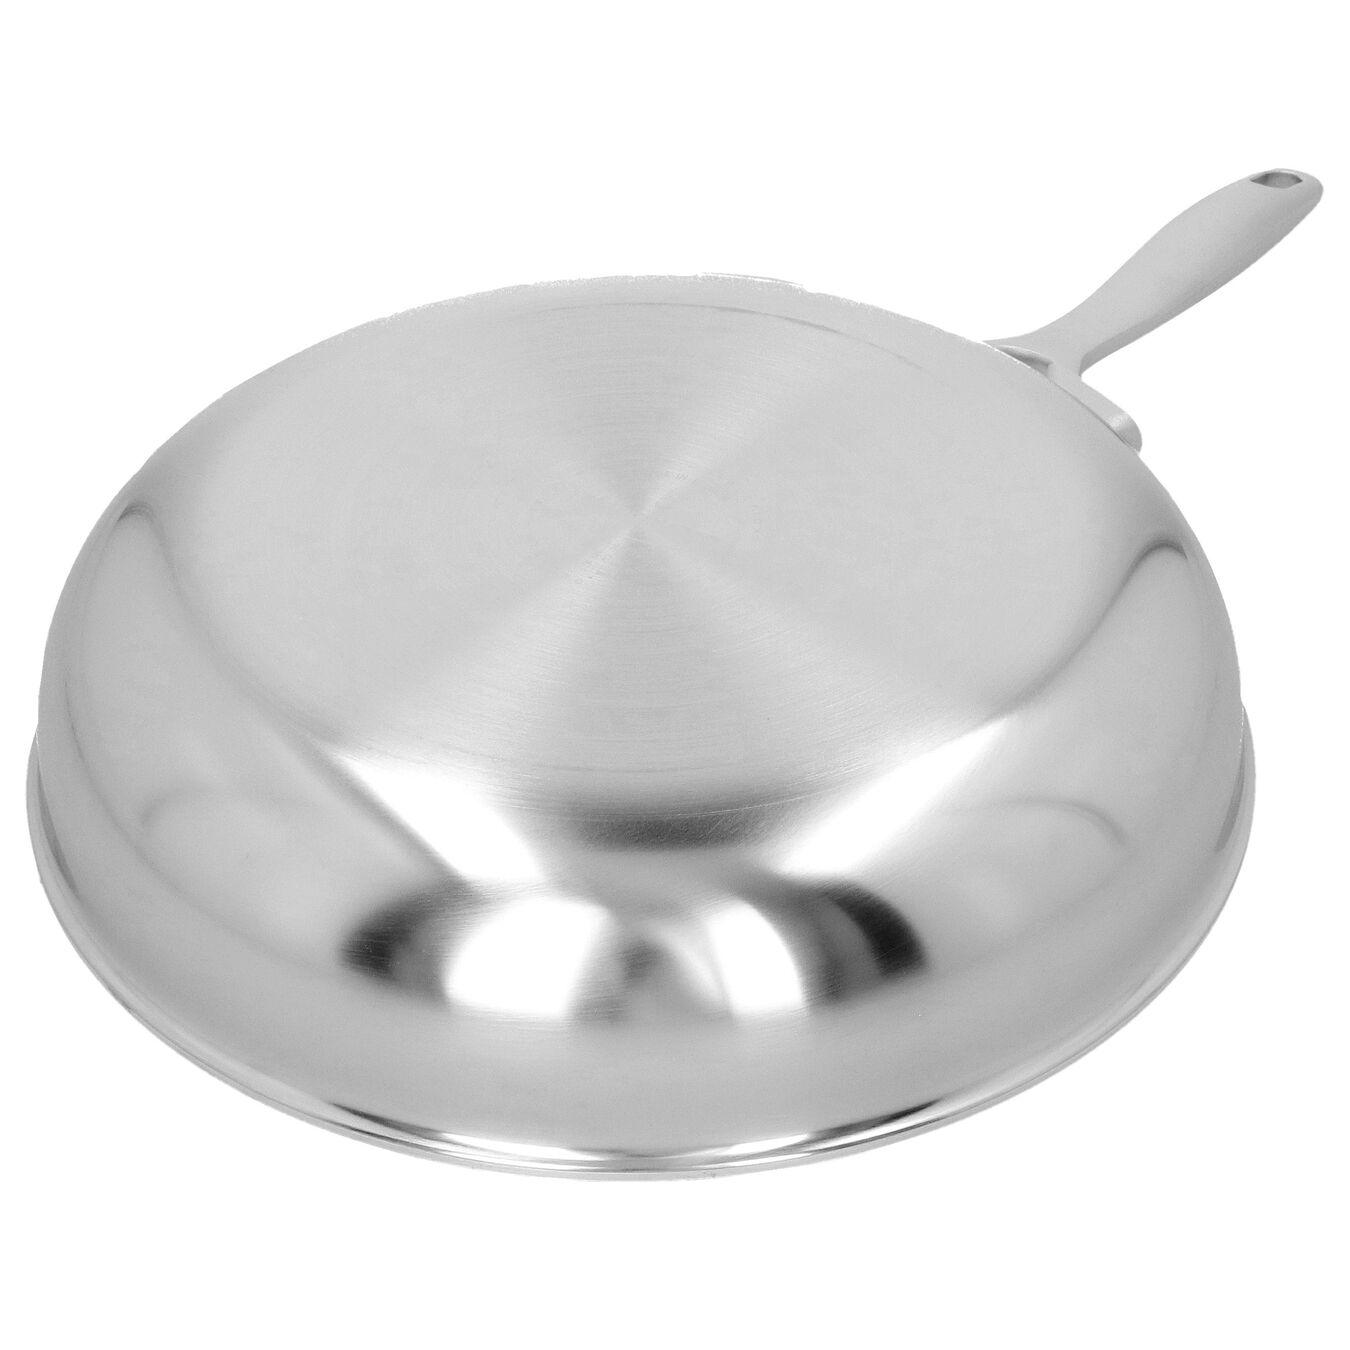 Stekpanna 24 cm, 18/10 Rostfritt stål, Silver-Svart,,large 5